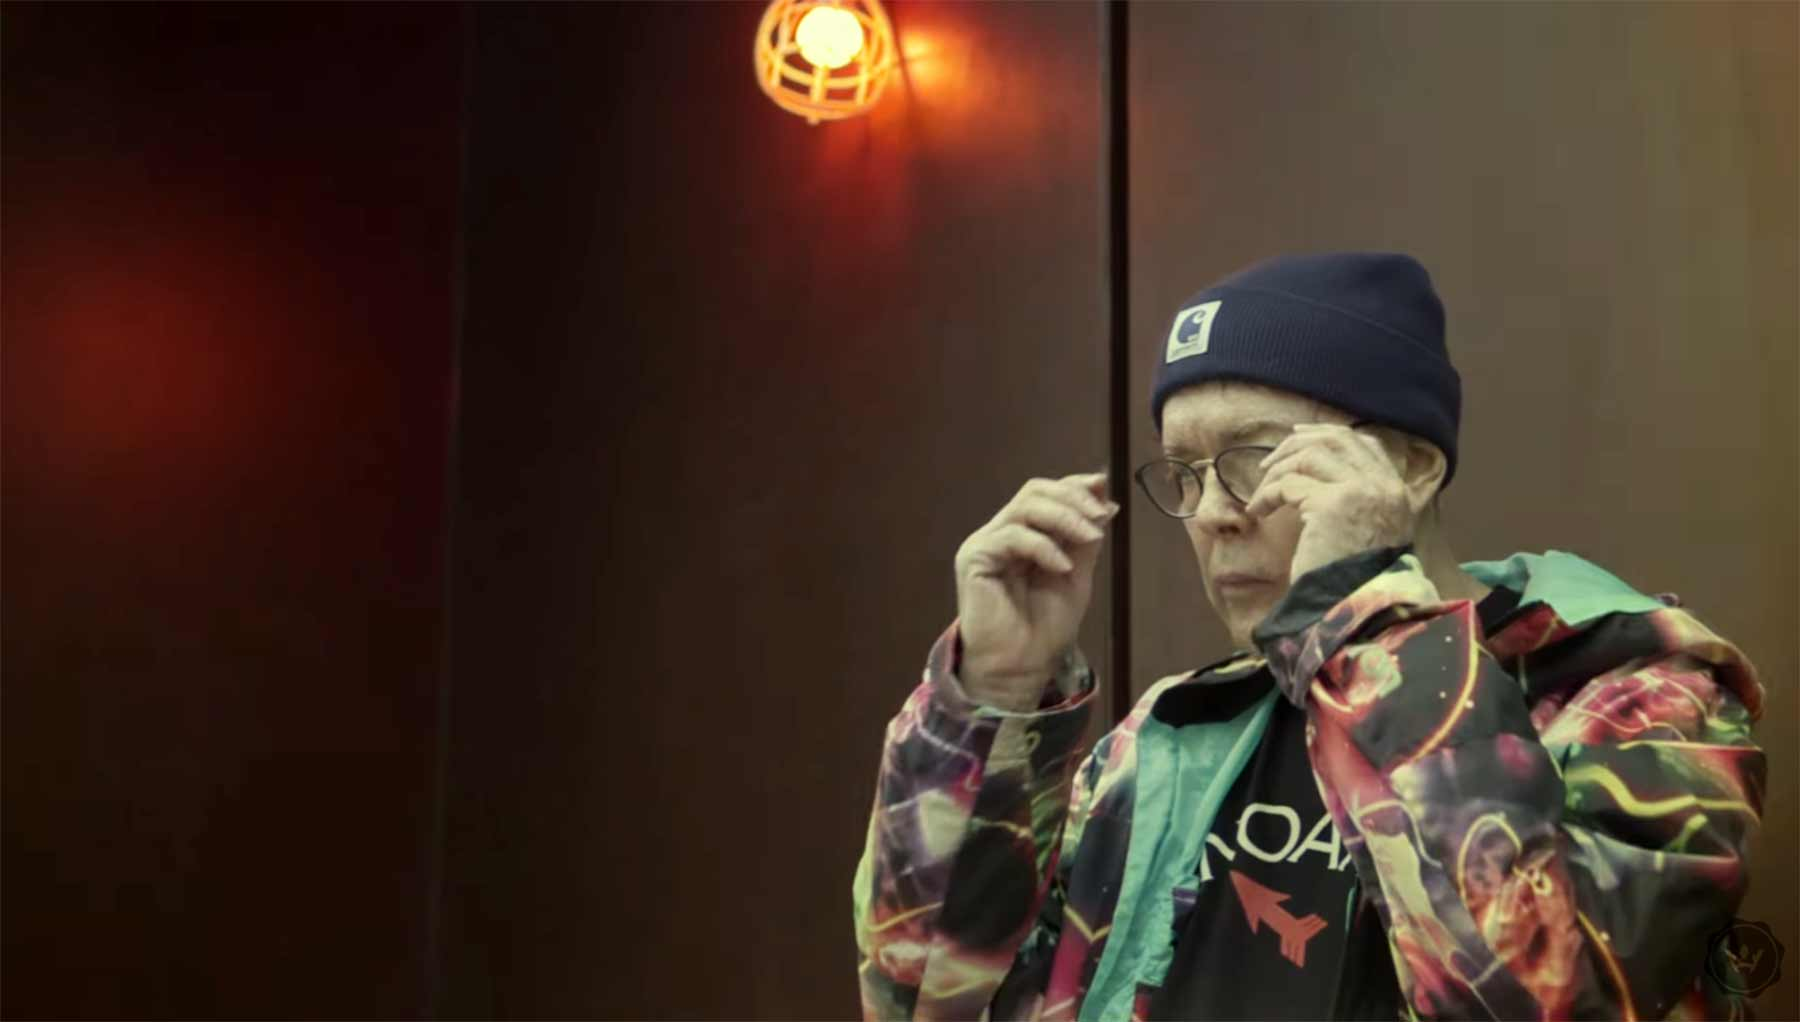 Der 73-jährige Charles Allcroft lebt Streetwear Charles-Allcroft-streetwear